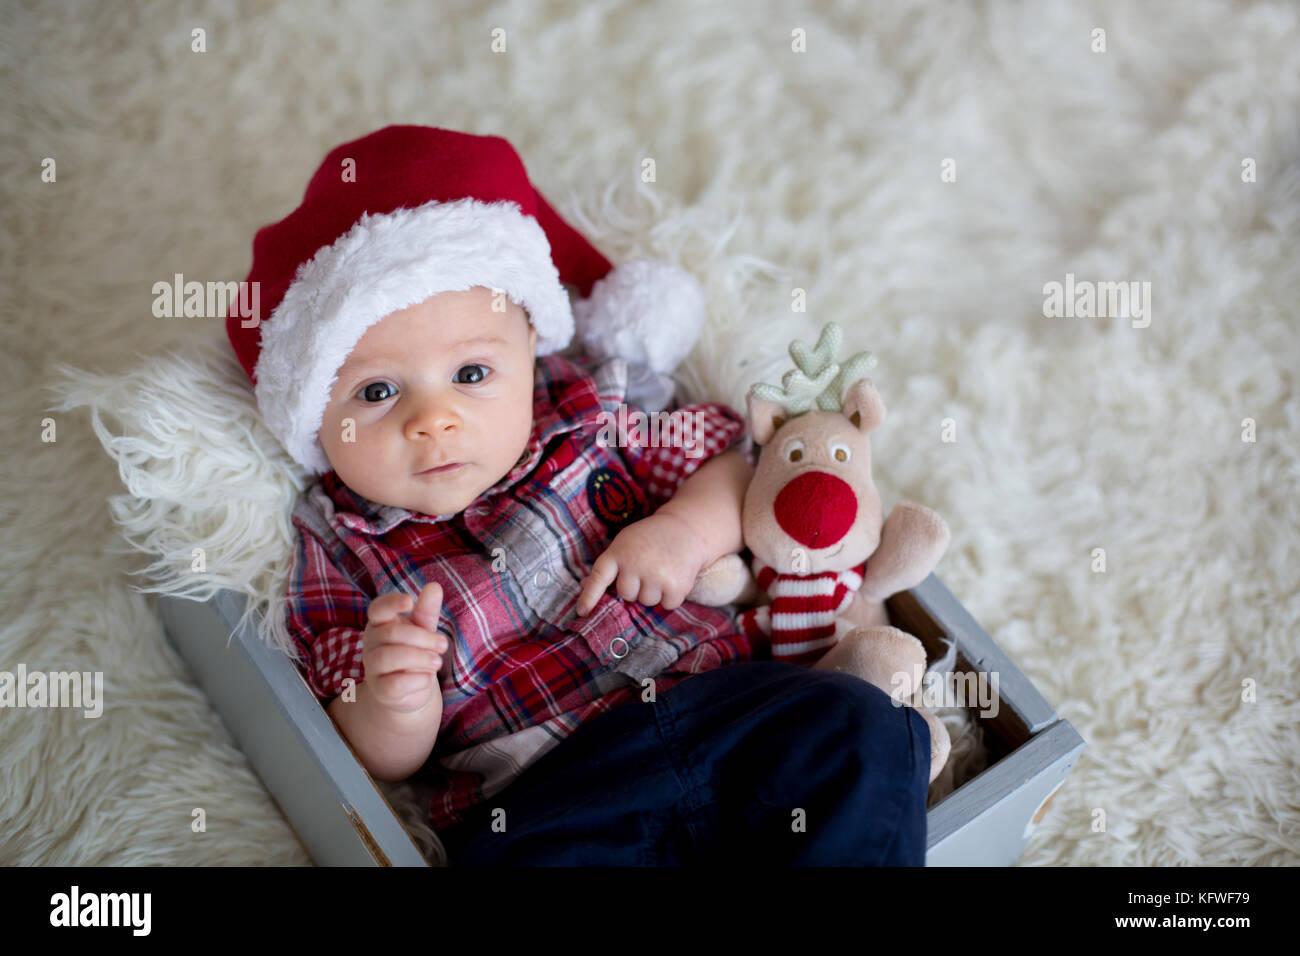 0737da2a544a Christmas portrait of cute little newborn baby boy